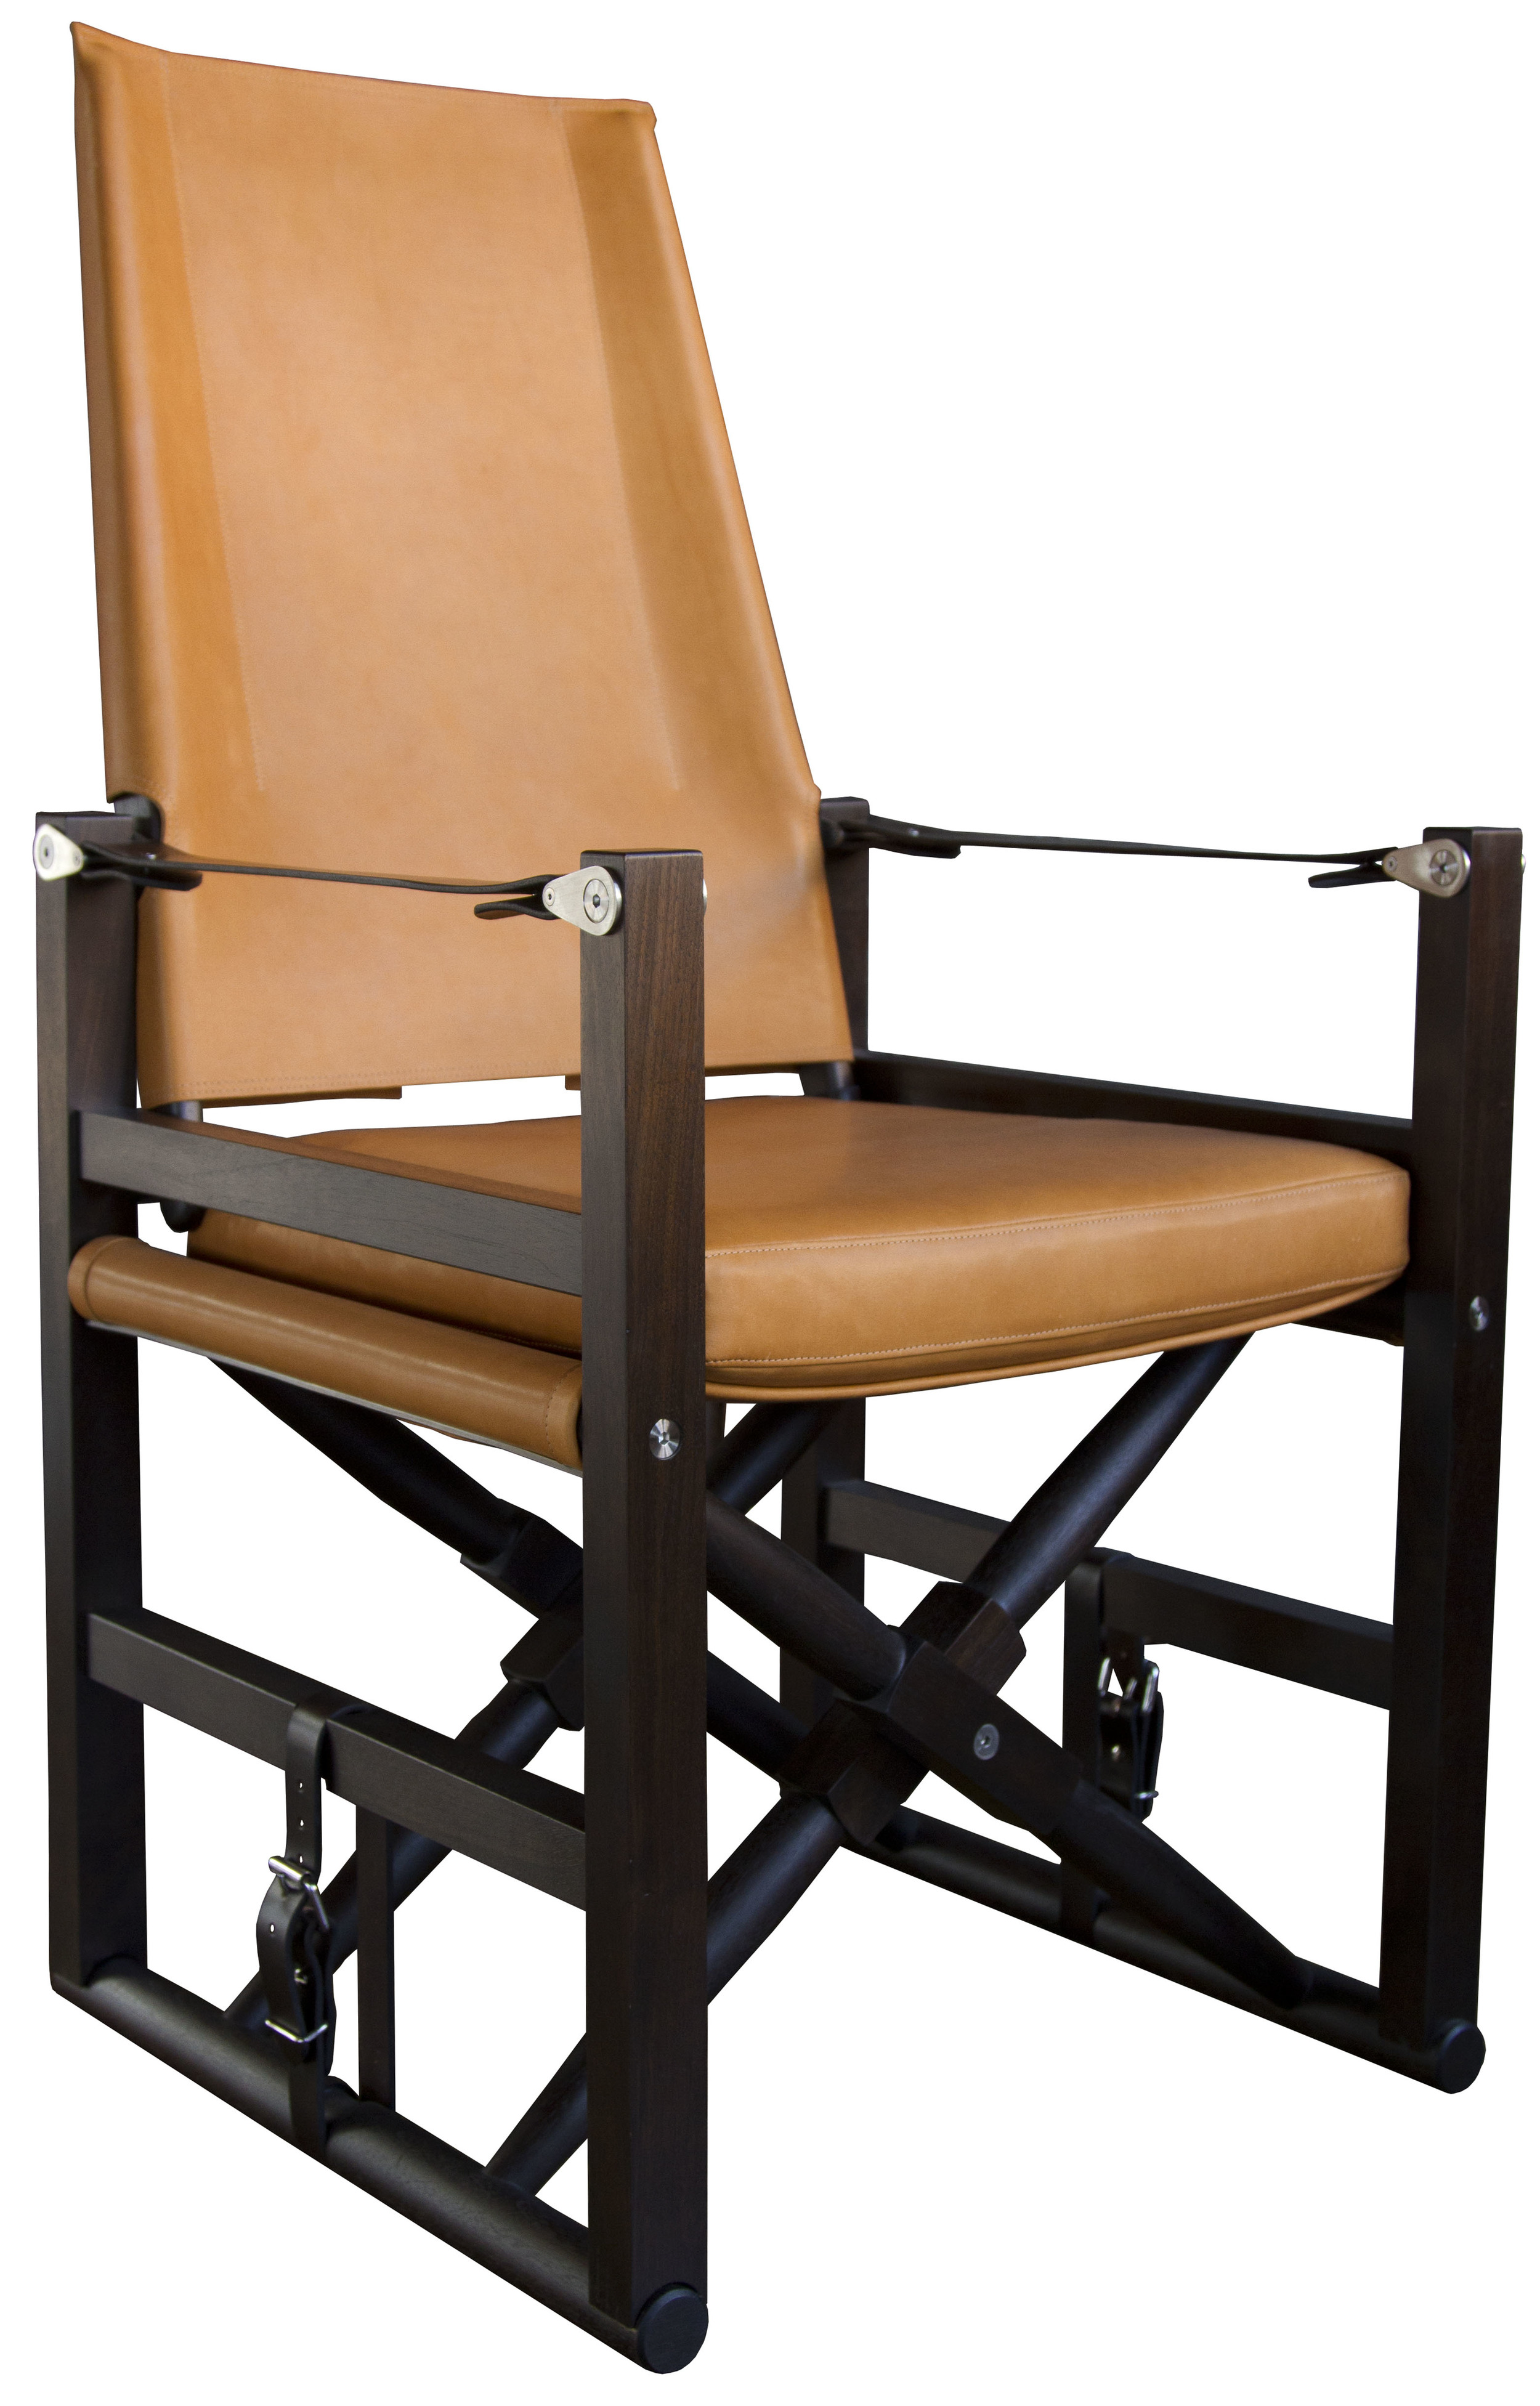 Cabourn Sail Chair - folding